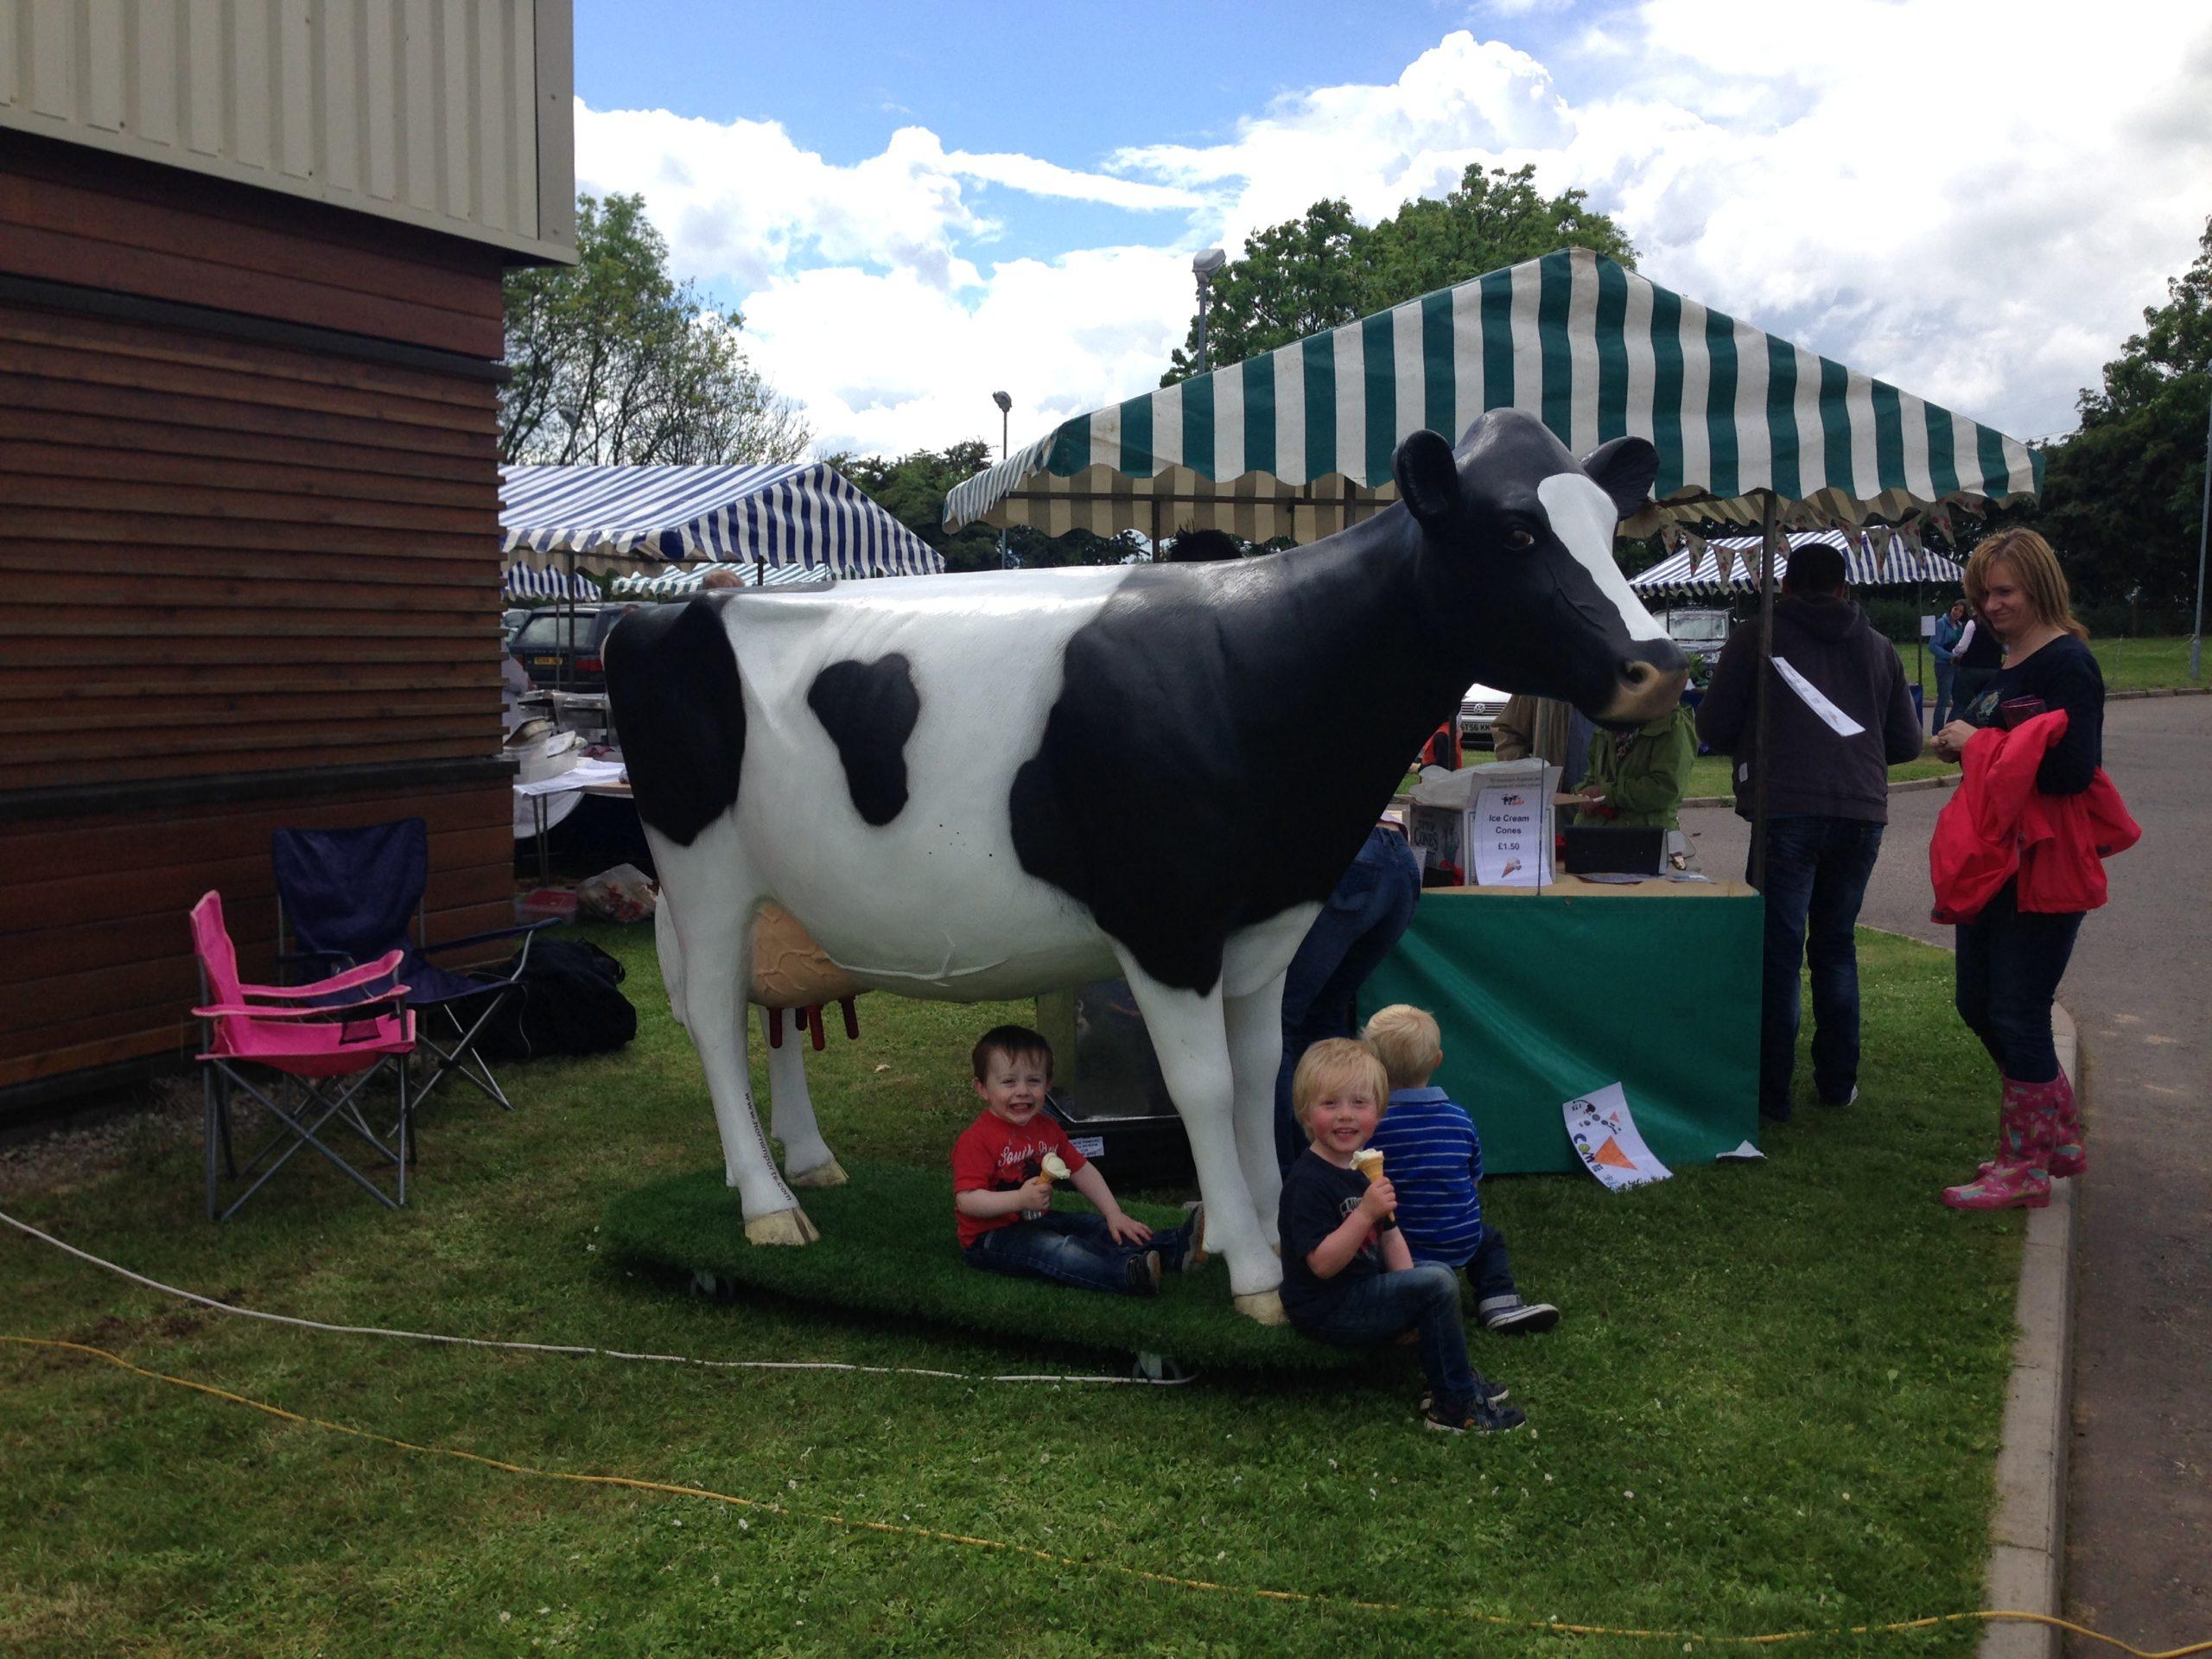 3D Model Milking Fibreglass Cow at Farm Open Day